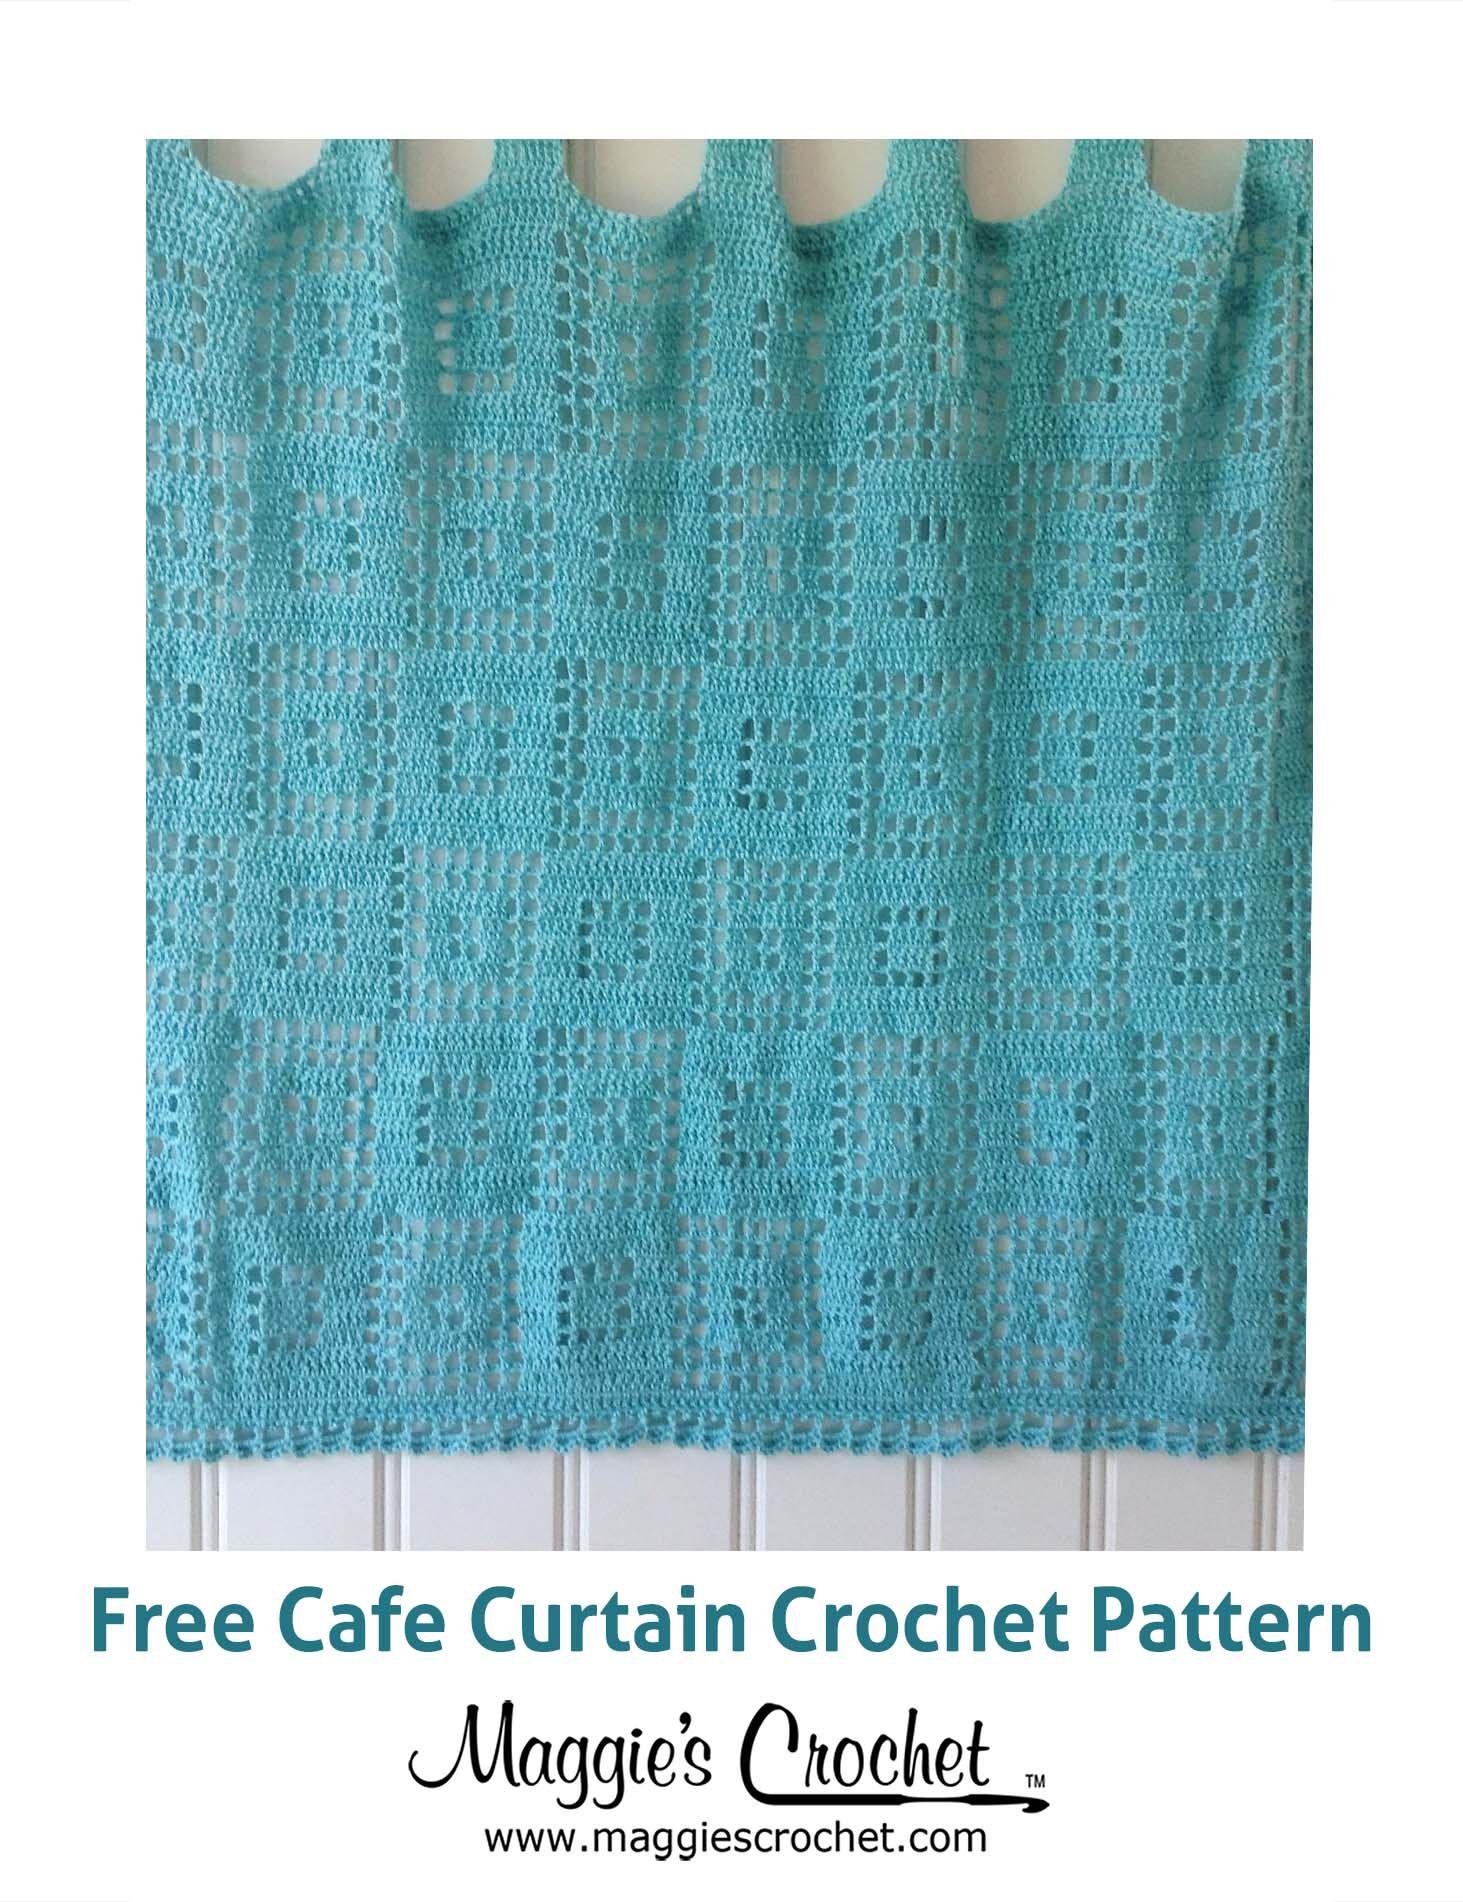 Cafe Curtain Free Crochet Pattern | CROCHET FREE PATTERNS ...